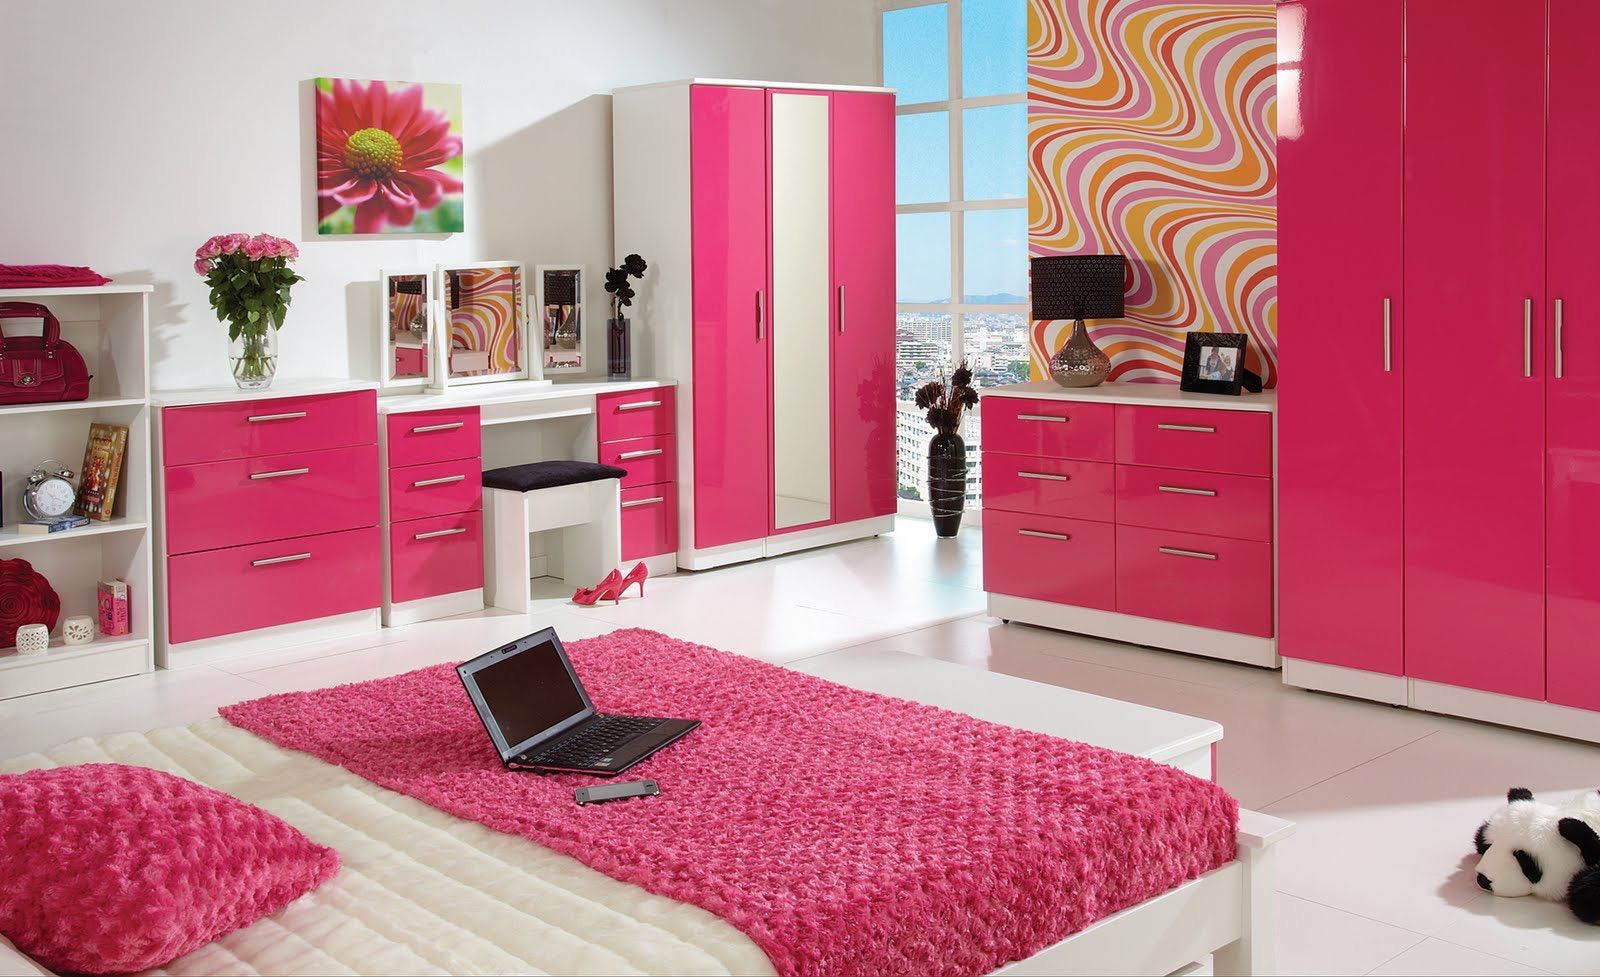 Interior bedroom design teenage girls pin by michelle leblanc on bedroom decor  pinterest  bedrooms